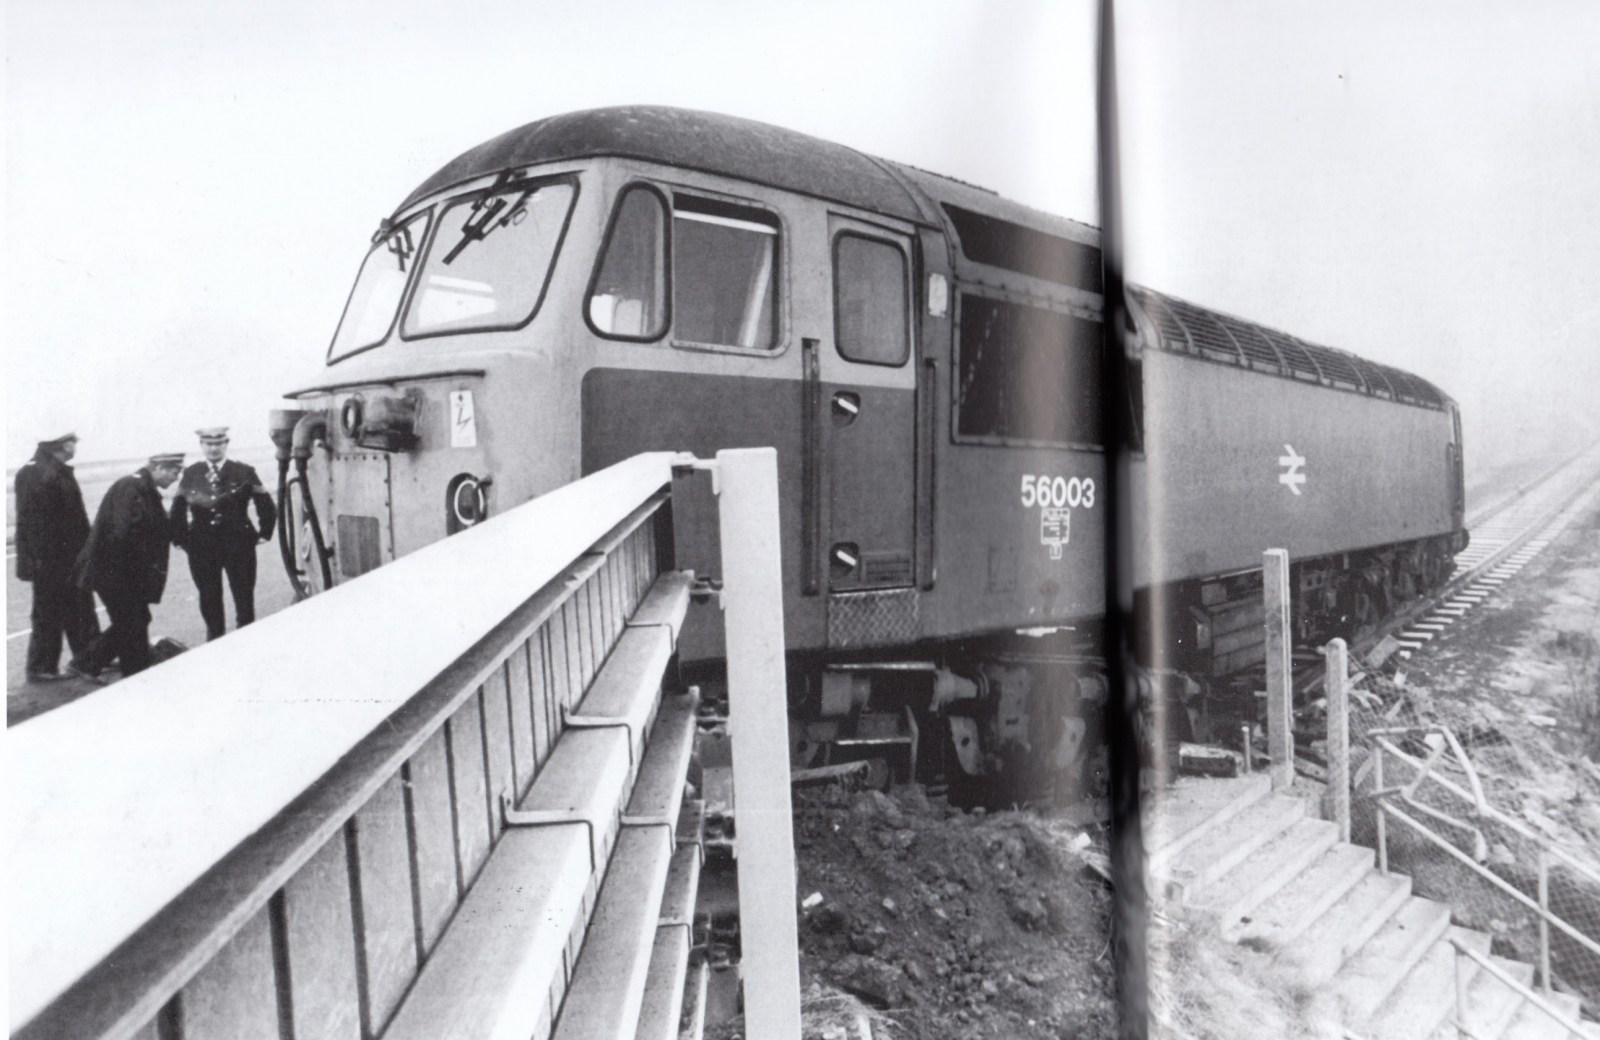 56 003 19 December 1978.jpg